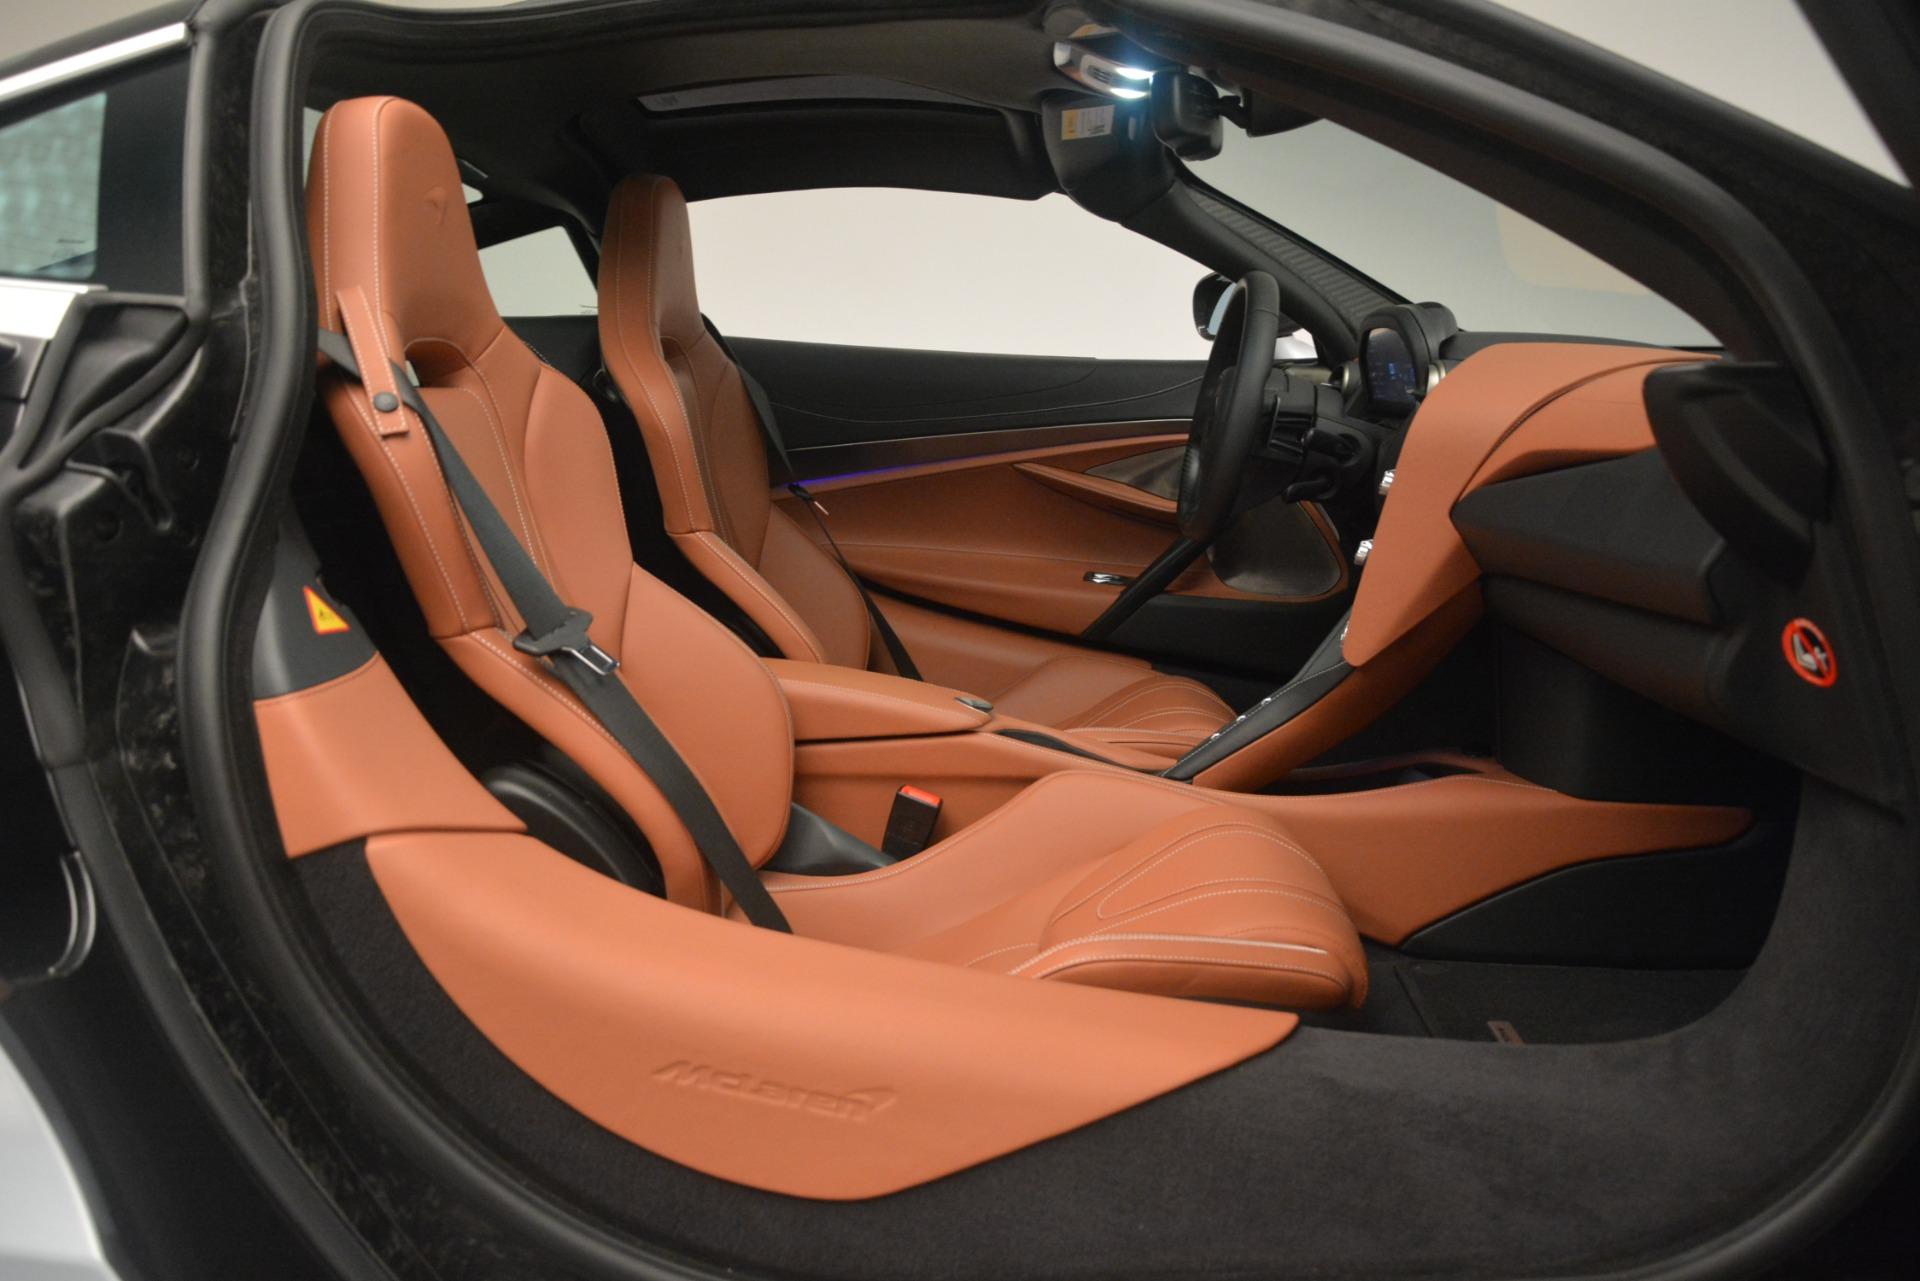 Used 2018 McLaren 720S Coupe For Sale In Westport, CT 3157_p19